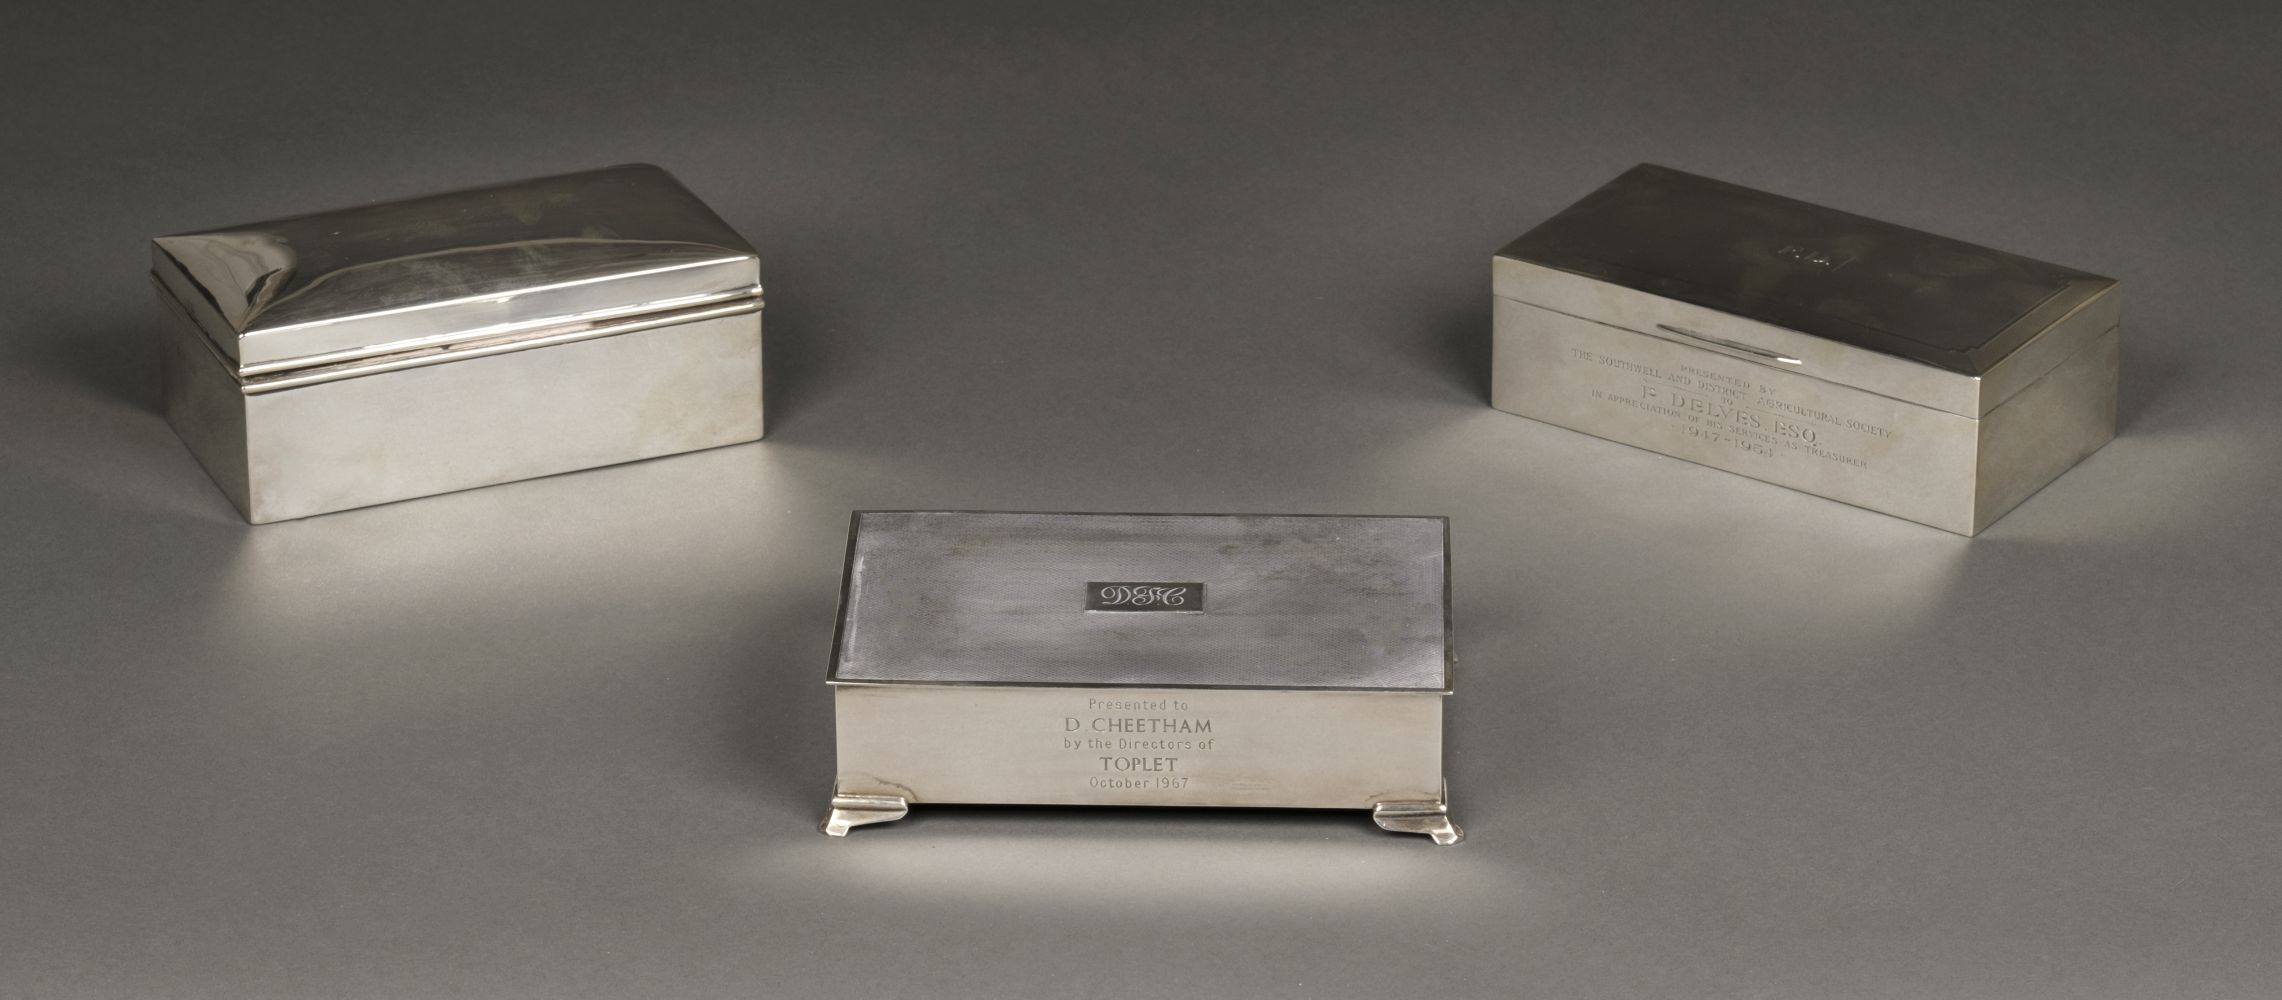 * Cigarette Boxes. Silver boxes